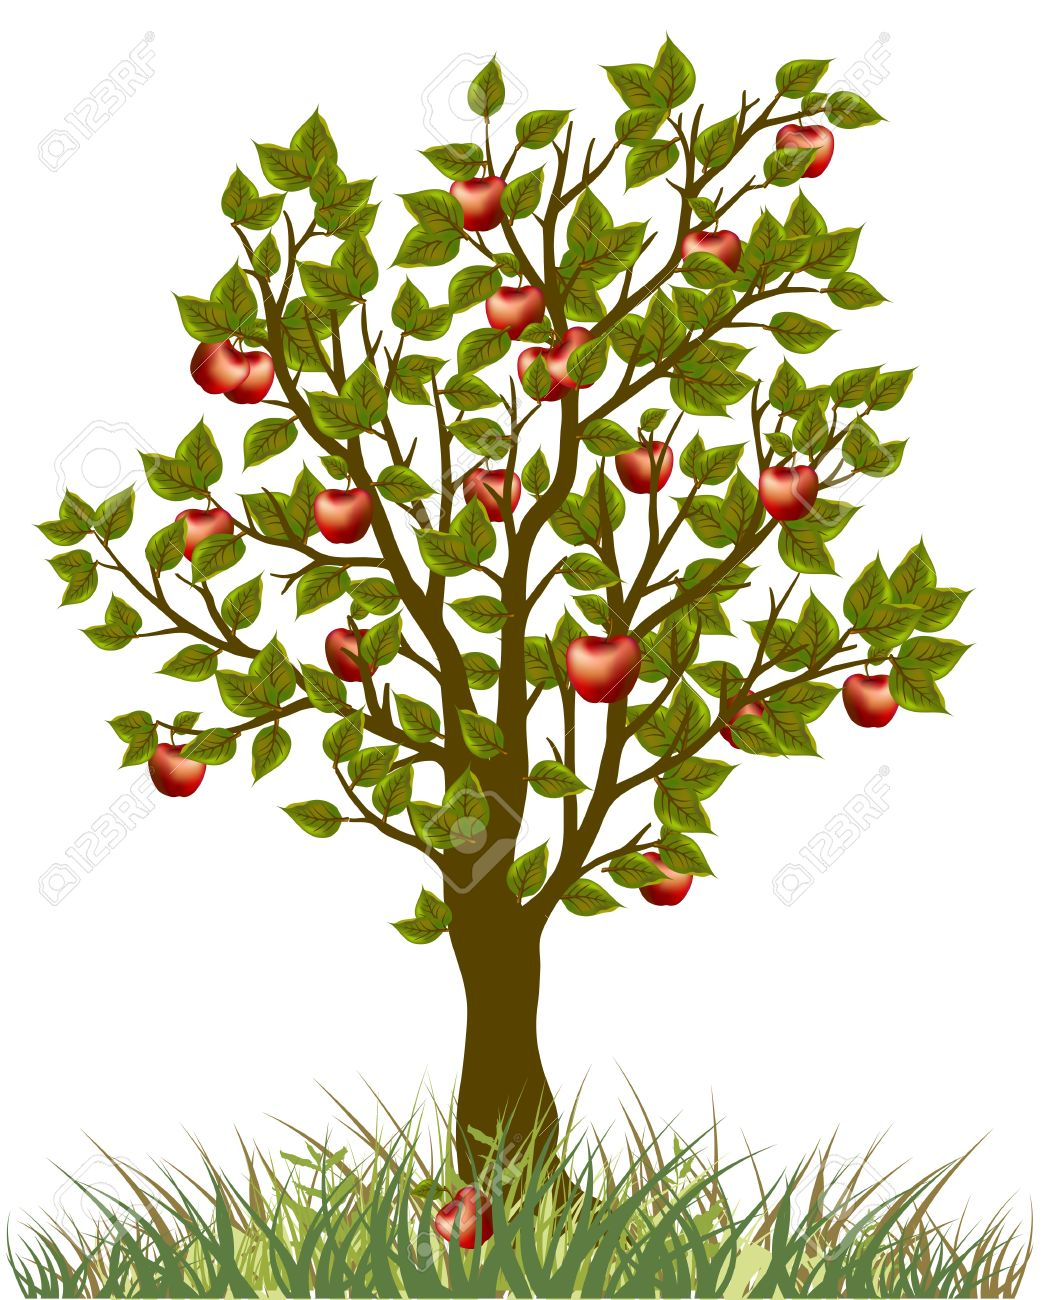 apple tree illustration. apple tree stock vector - 12494396 illustration